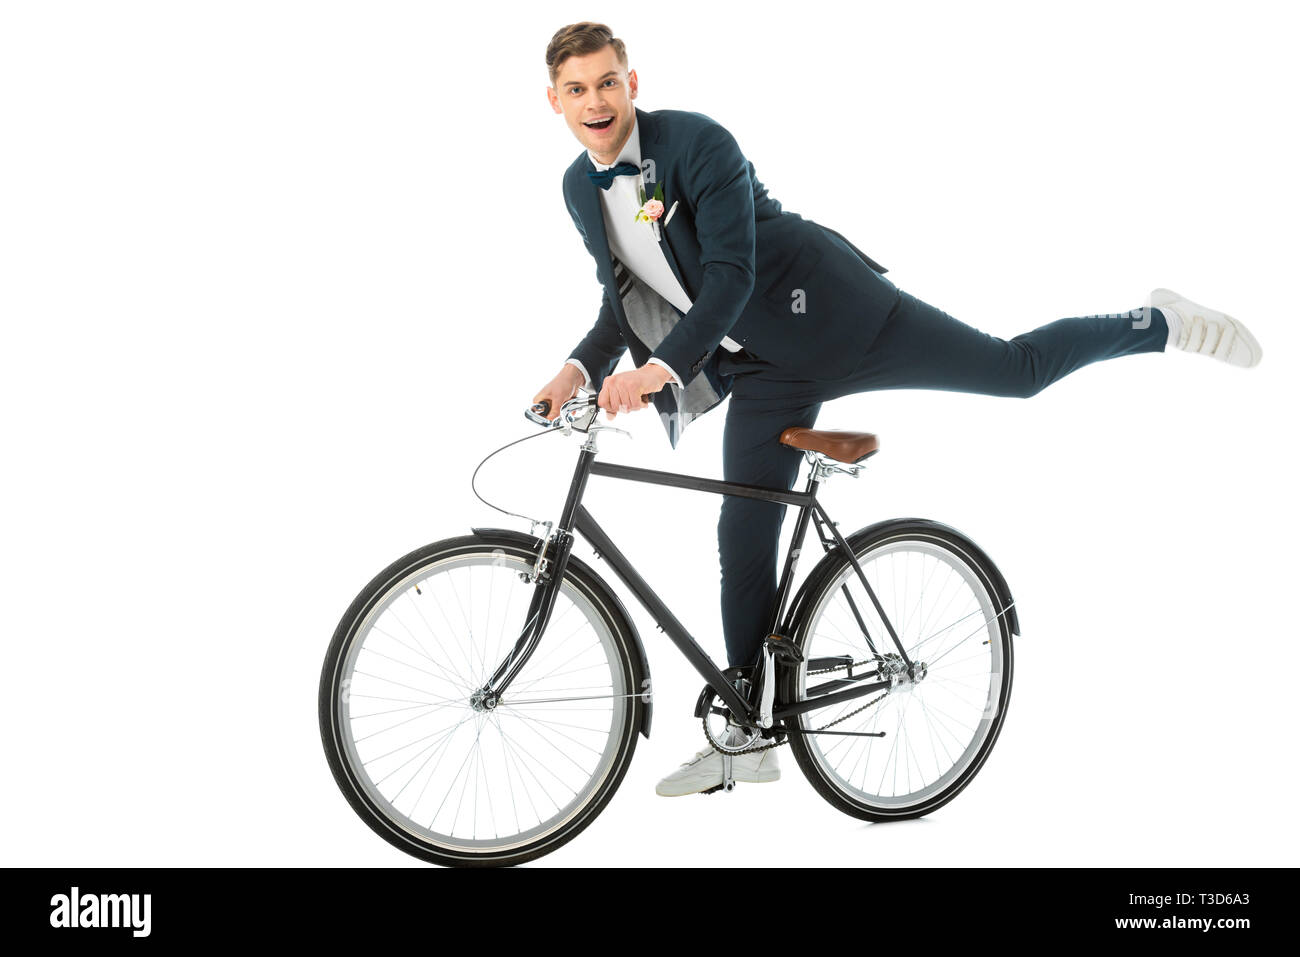 cheerful groom in elegant suit making stunts on bike isolated on white - Stock Image